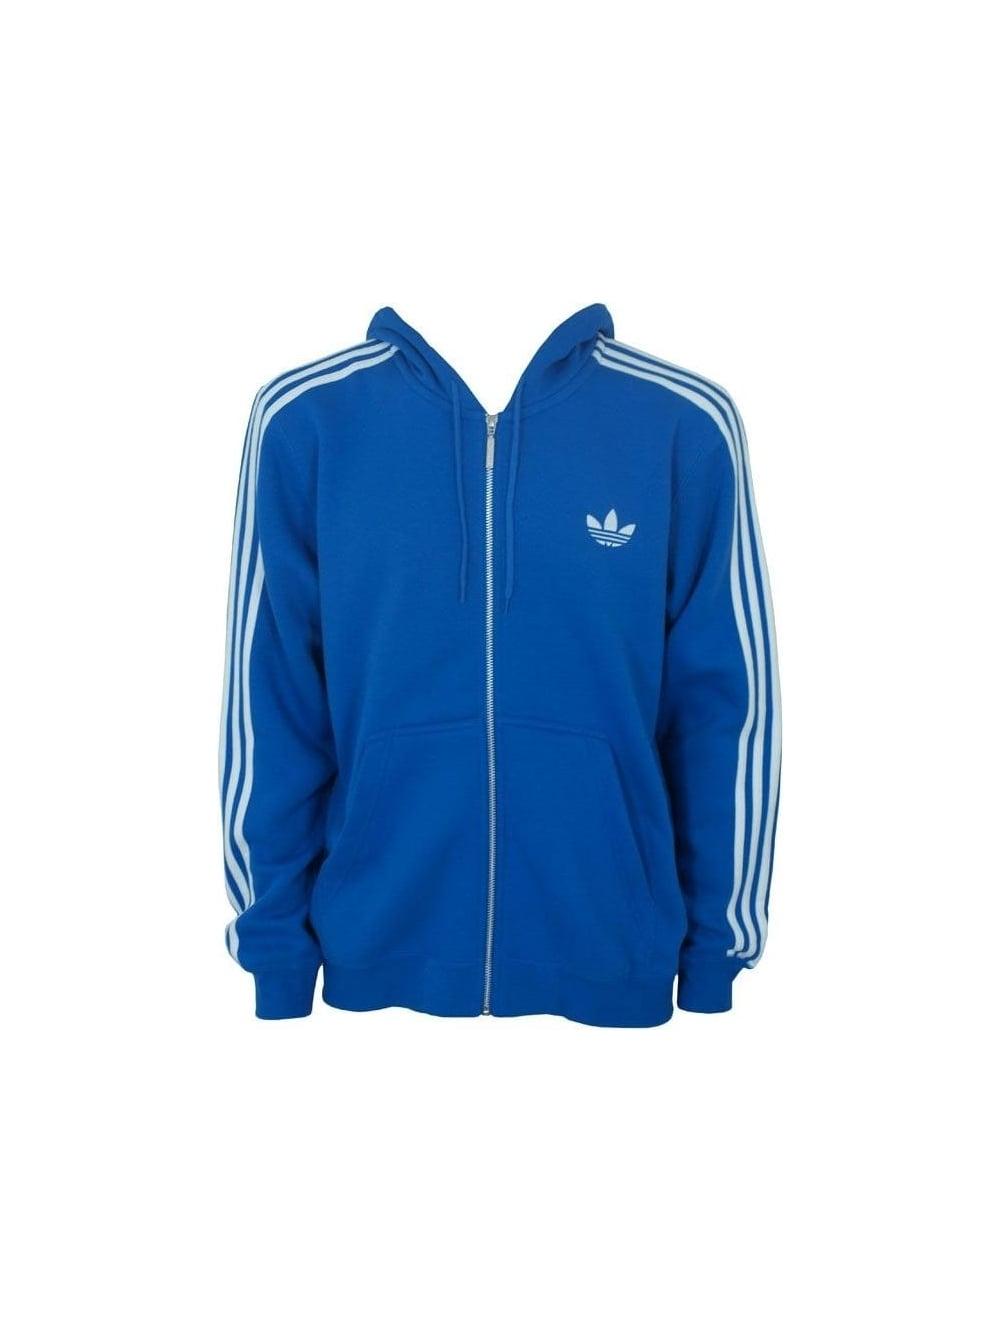 Adidas Spo Hooded Flock Track Top in Bluebird - Shop Adidas ... 2d5241b35